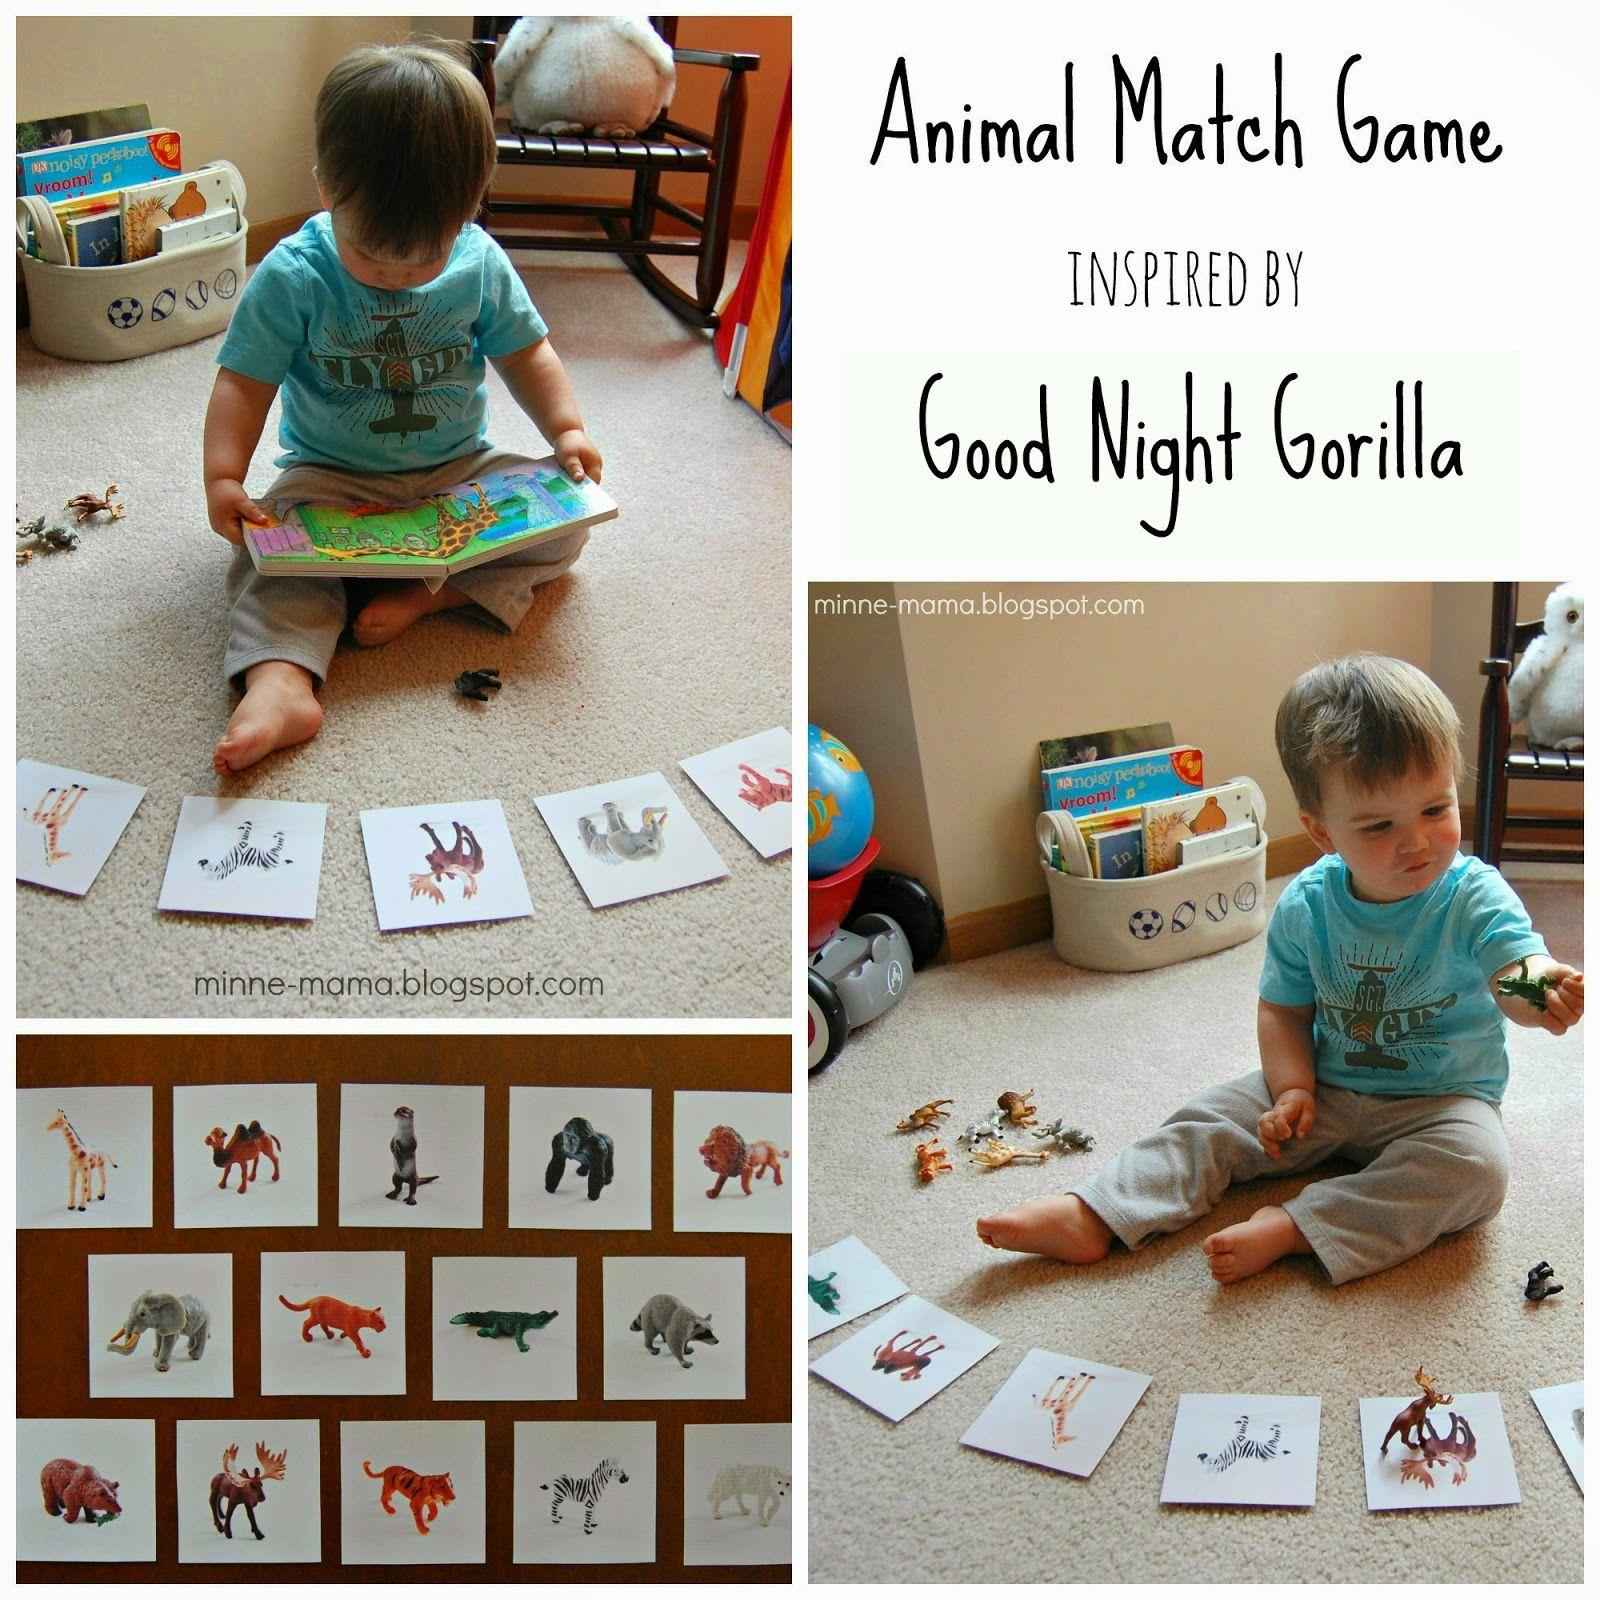 Good Night Animals Match Game